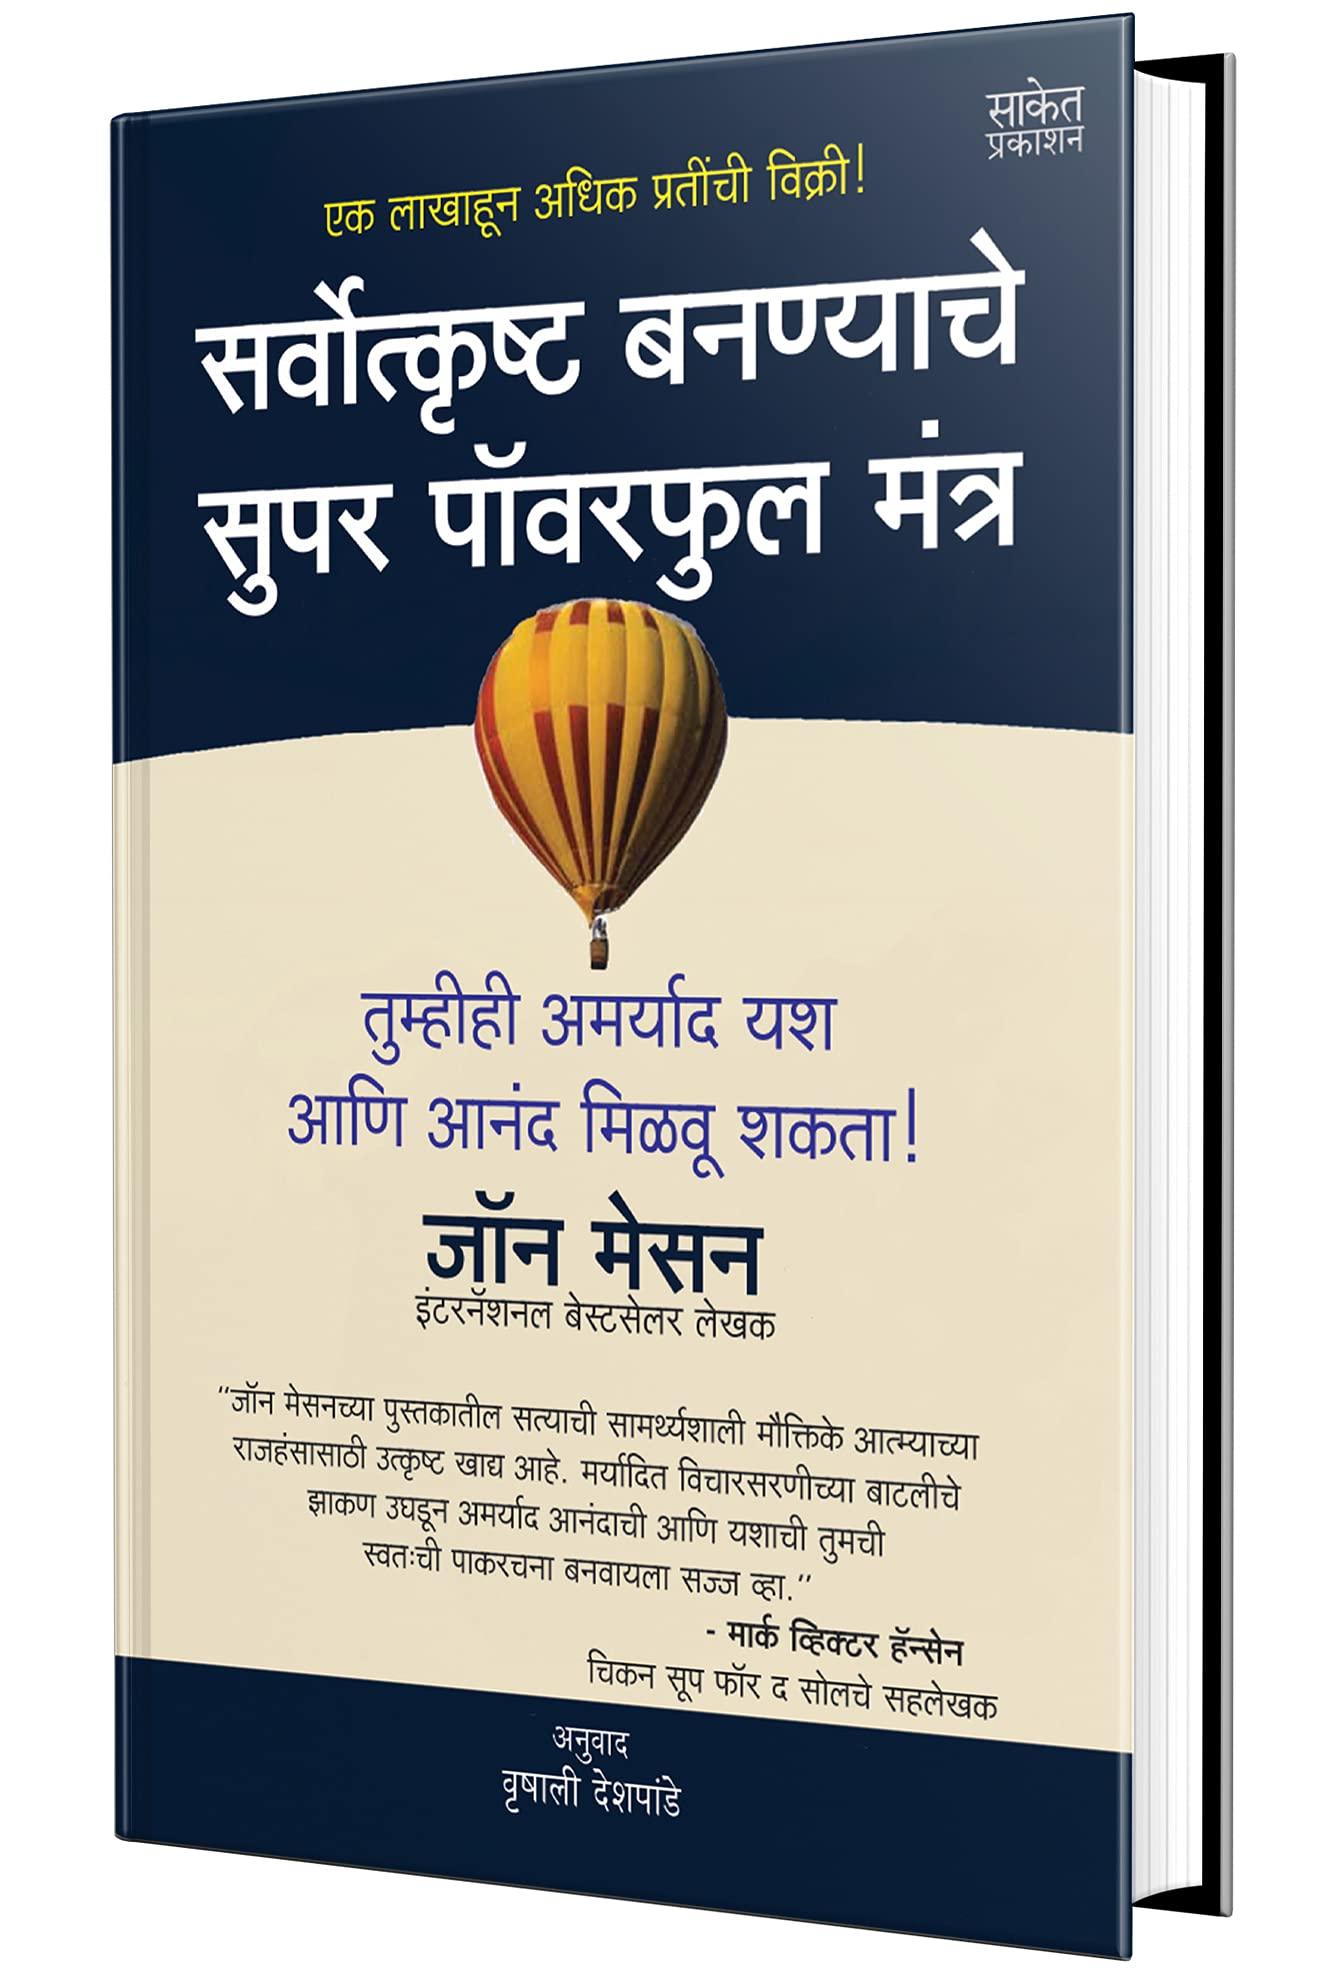 Sarvotkrushta Bananyache Super Powerful Mantra: Know Your Limits Then Ignore Them – Marathi